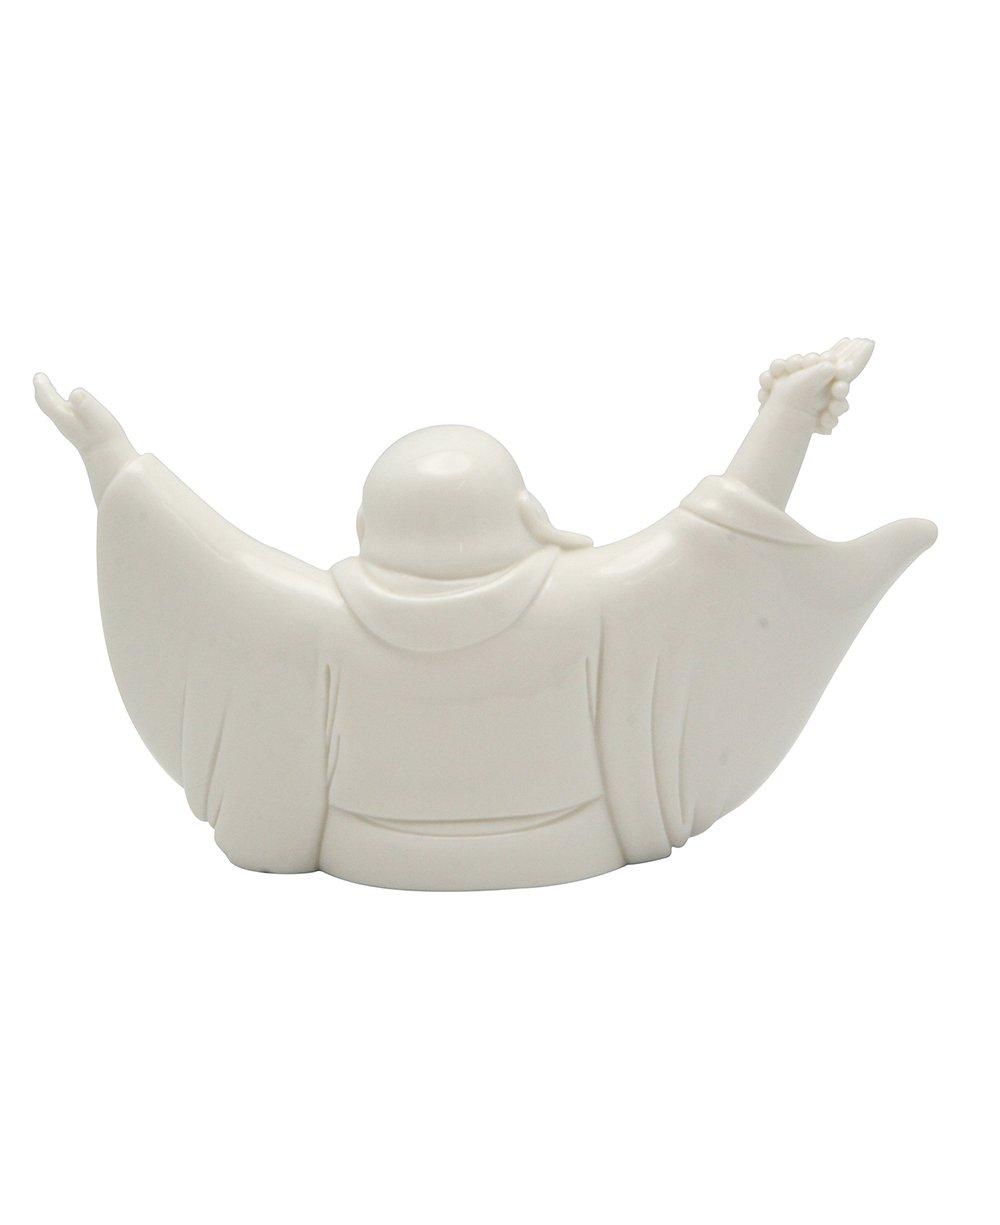 Cheering Happy Buddha Porcelain Statue